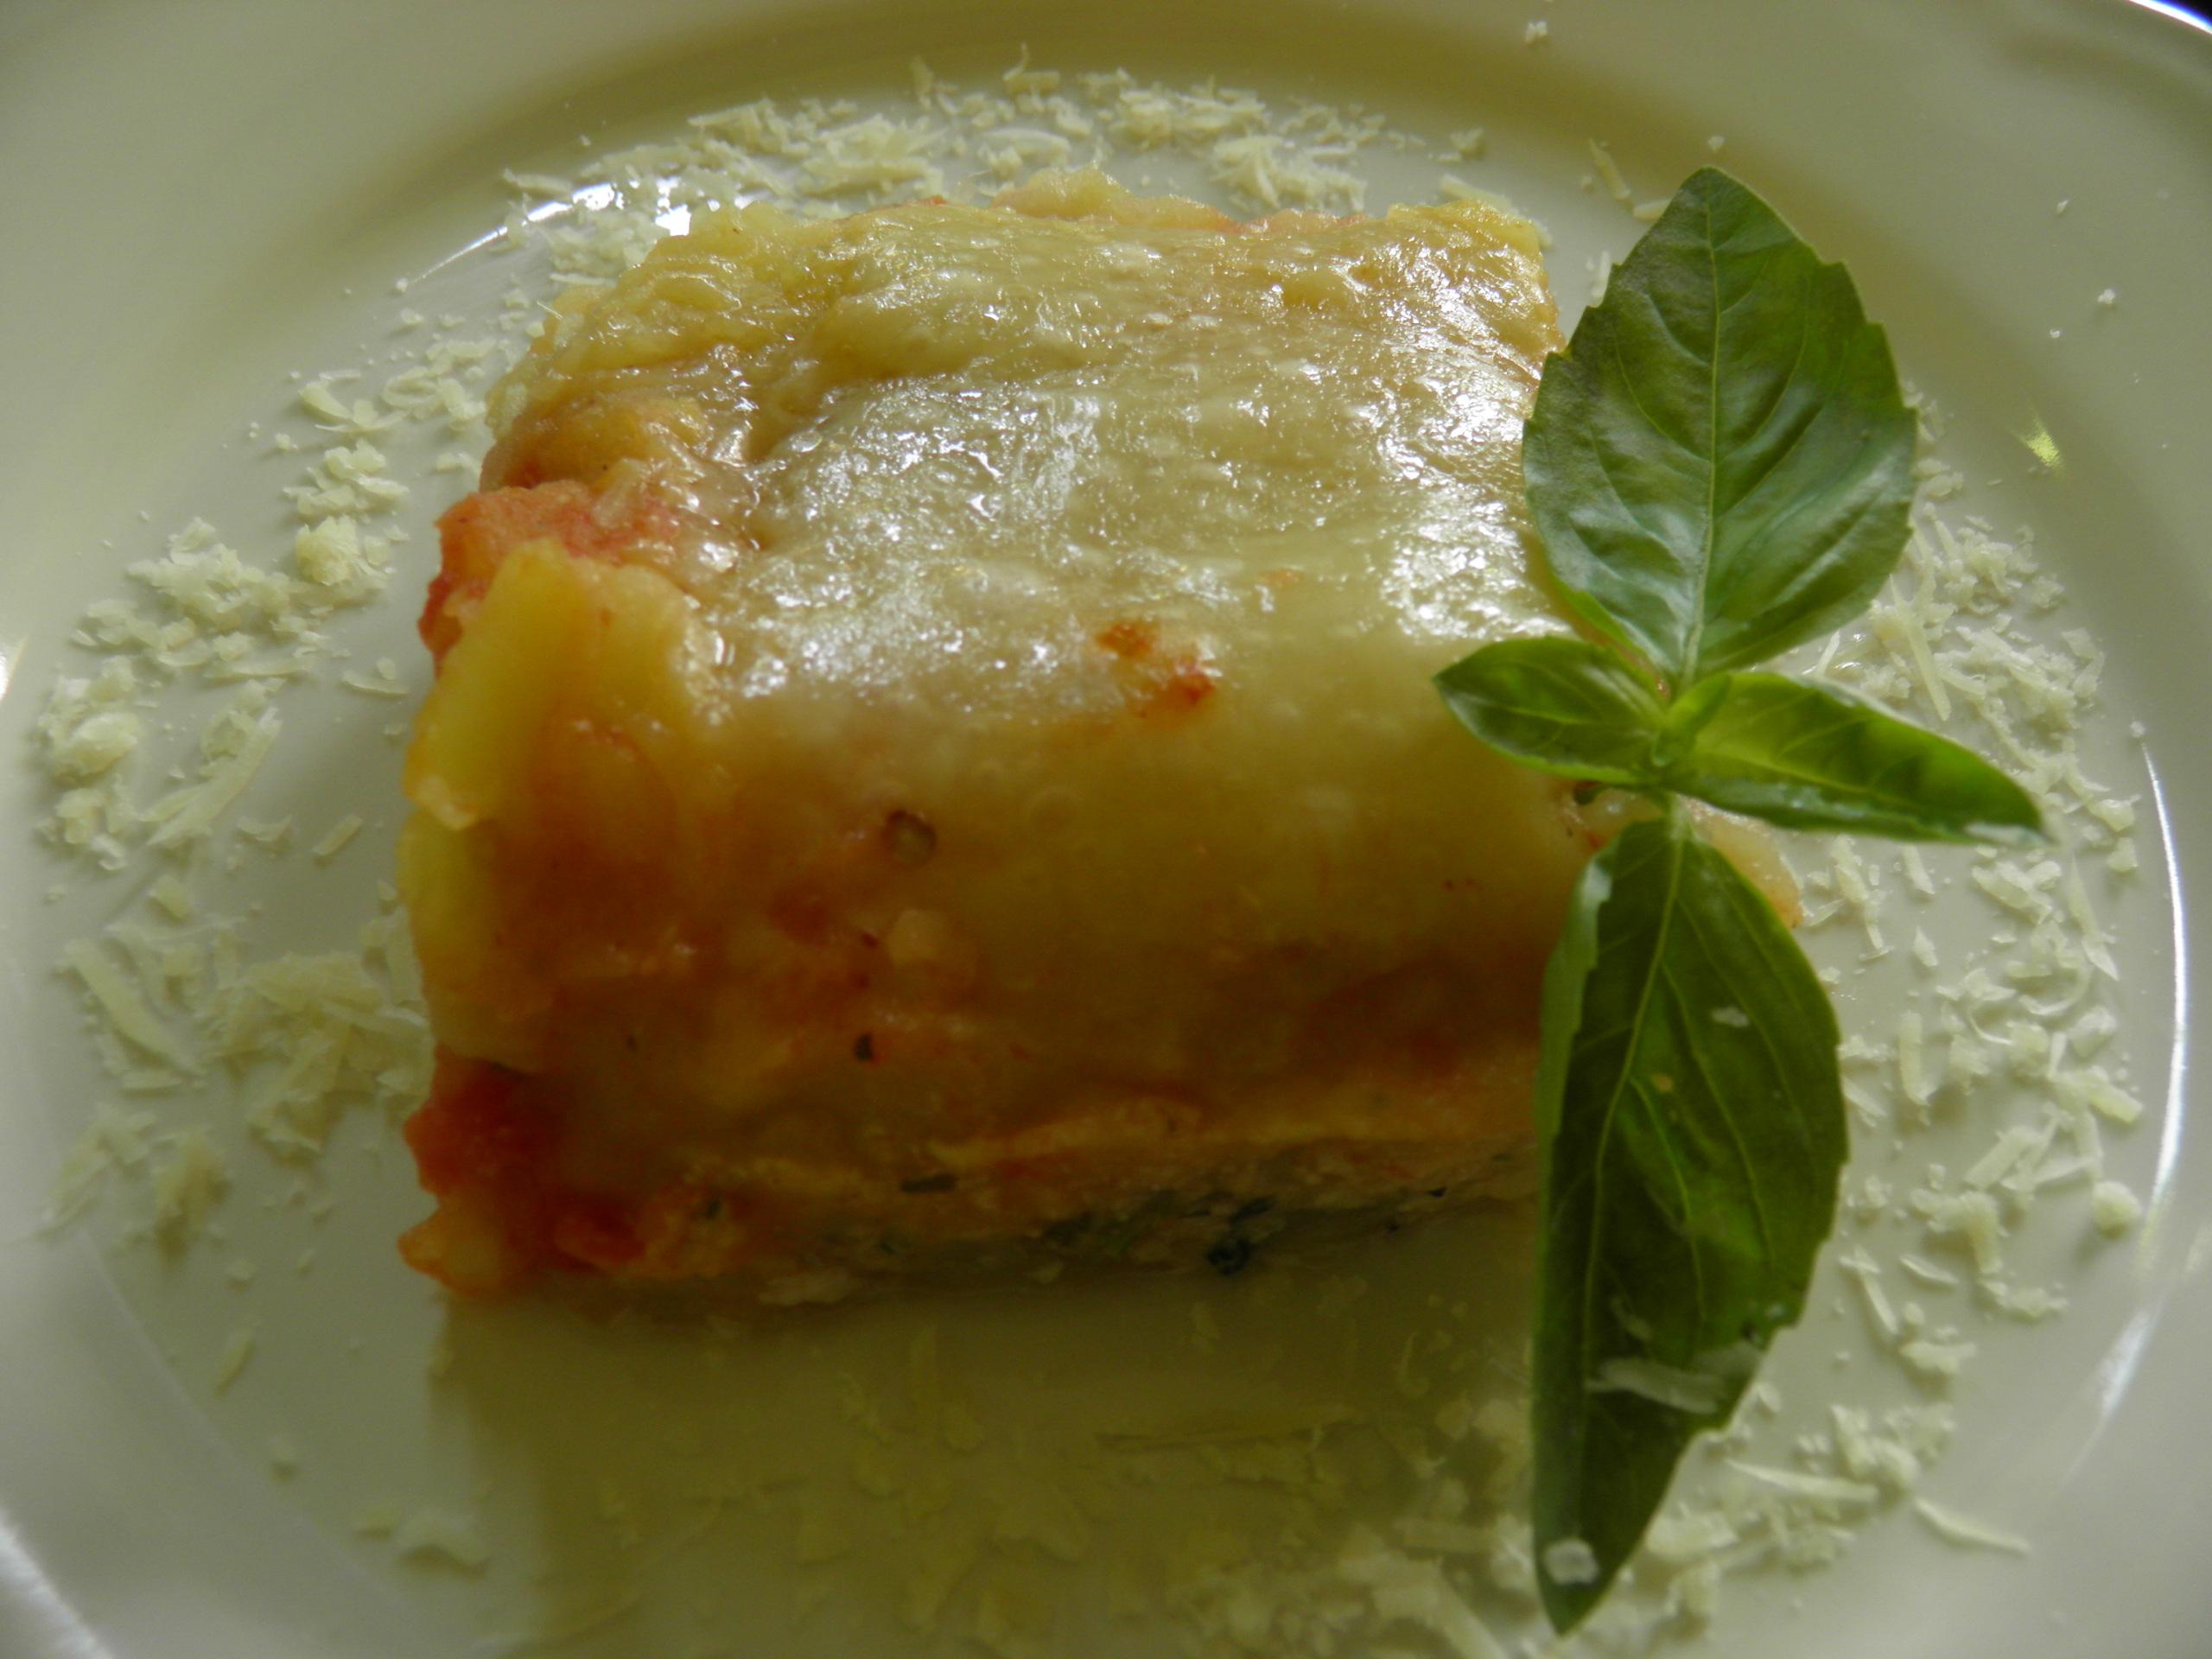 Pastelon De Tayotas Relleno De Pollococina Caribe Cocina Caribe